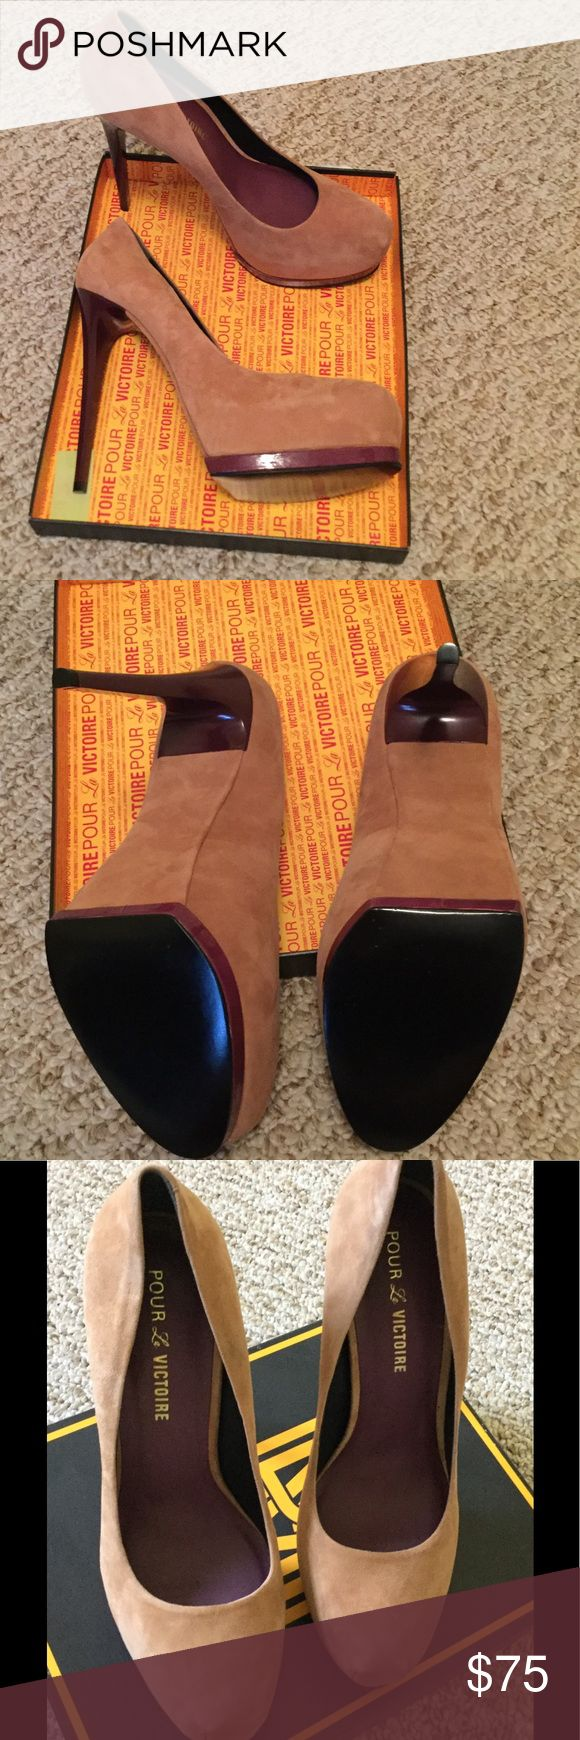 Pour la Victoire Zimmer size 9, new in box Camel HIGH Heels. Never worn. 6 inch heel with platform. Pour La Victoire Shoes Heels